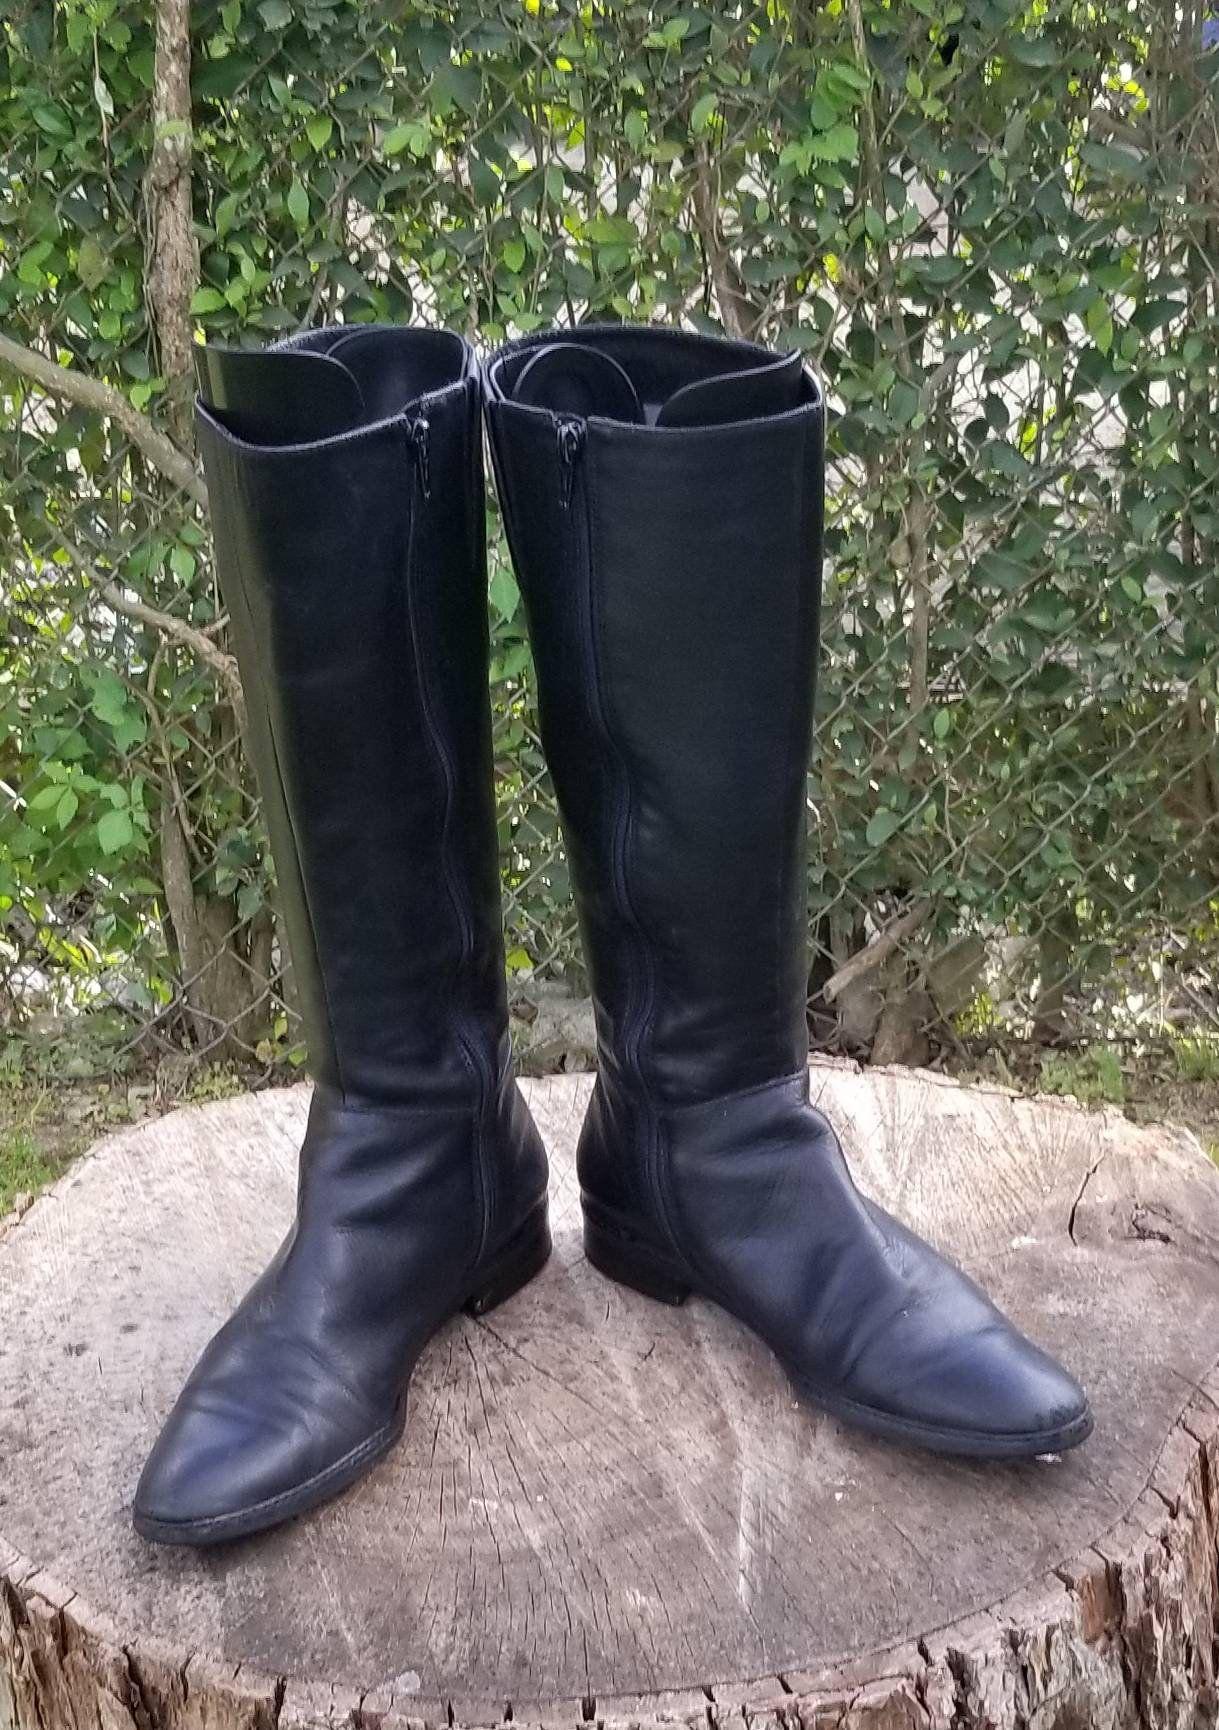 Sz 7 Vintage Riding BootsBlack Mid-Calf Boots80/'s Style